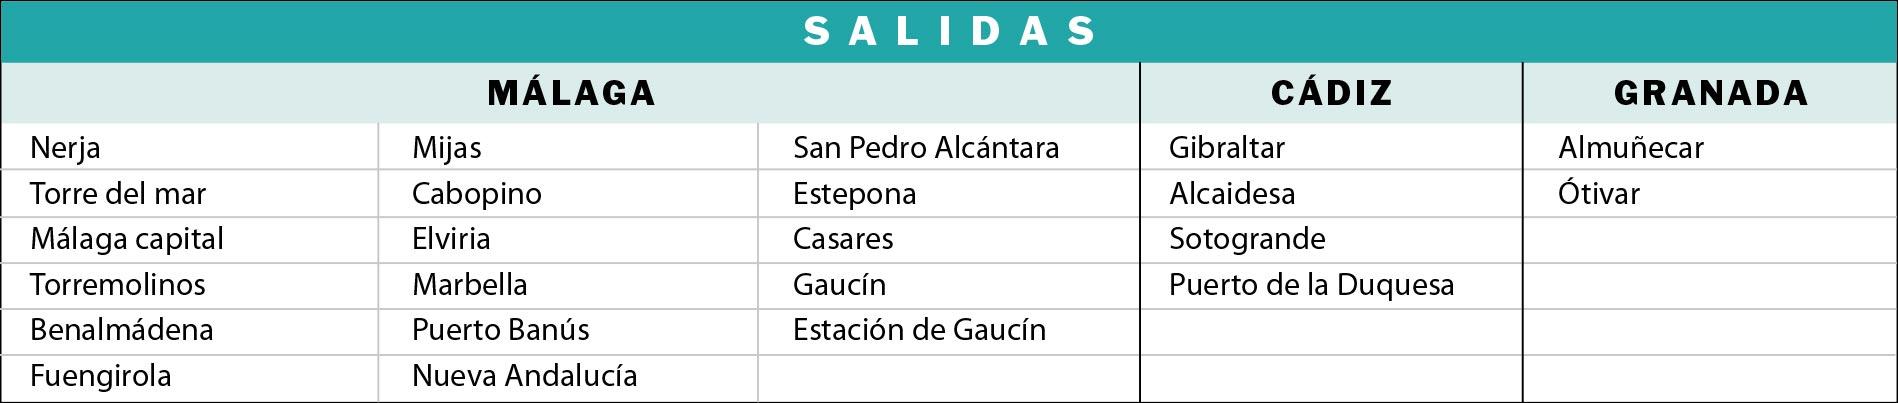 Salidas por ciudades para actividades Málaga y Cádiz